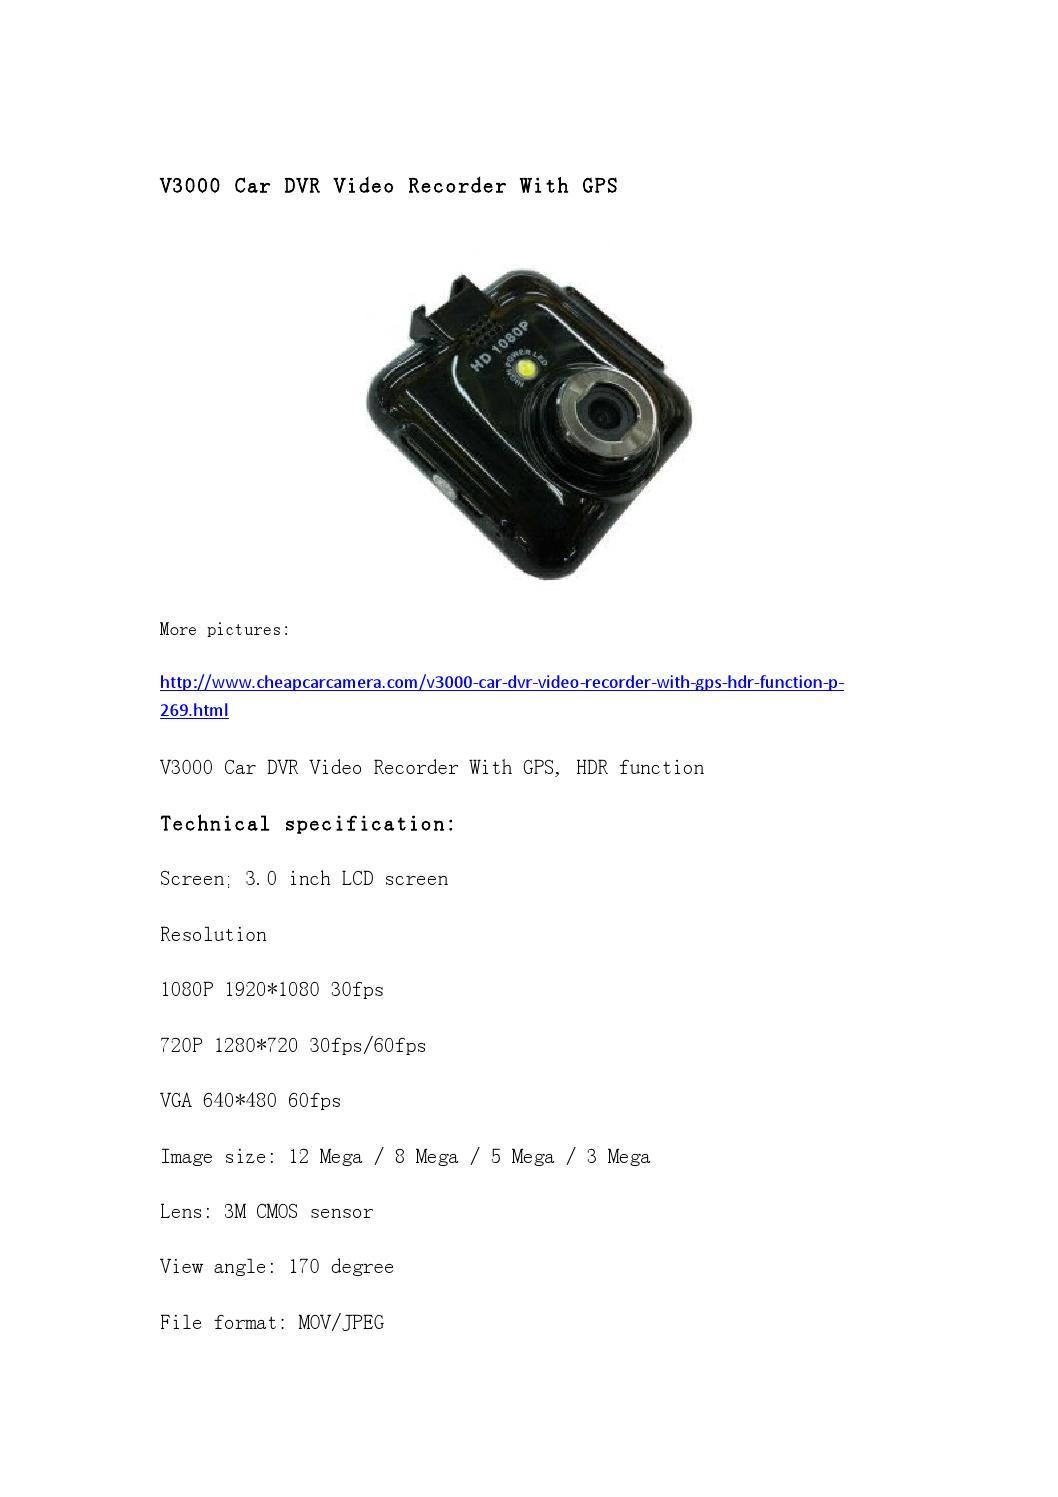 v3000 car dvr video recorder with gps by cardvr carcamera